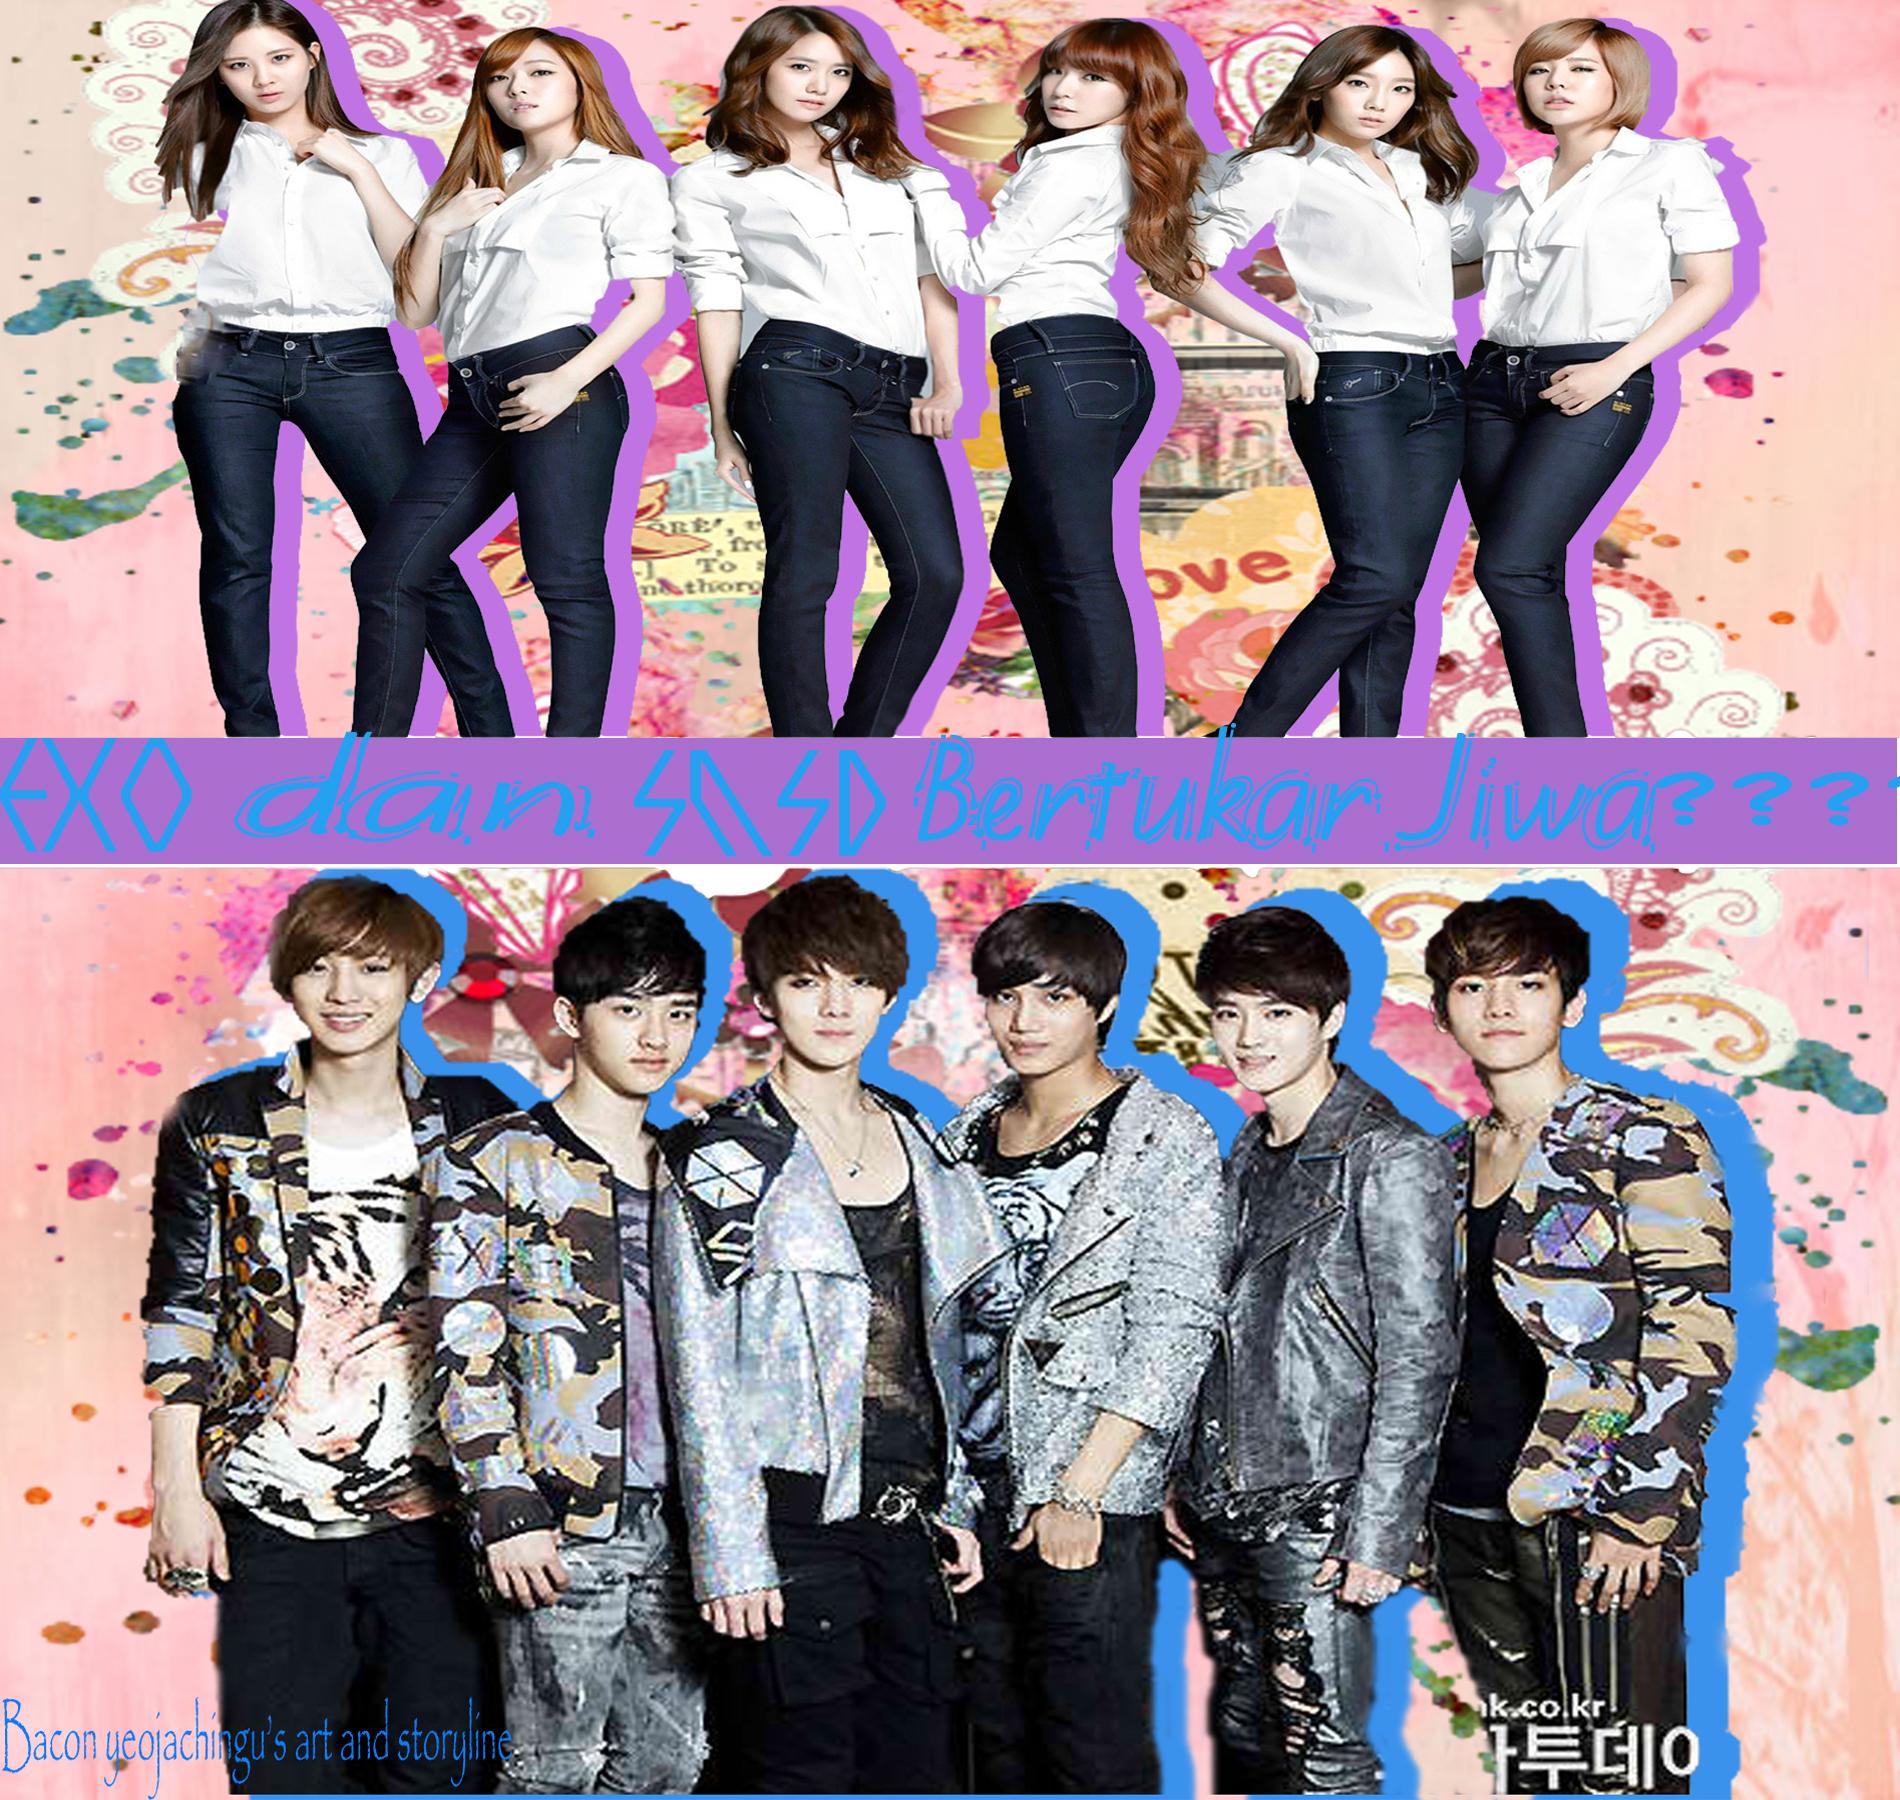 SMTOWN Family EXO DAN SNSD BERTUKAR JIWA Chapter 1